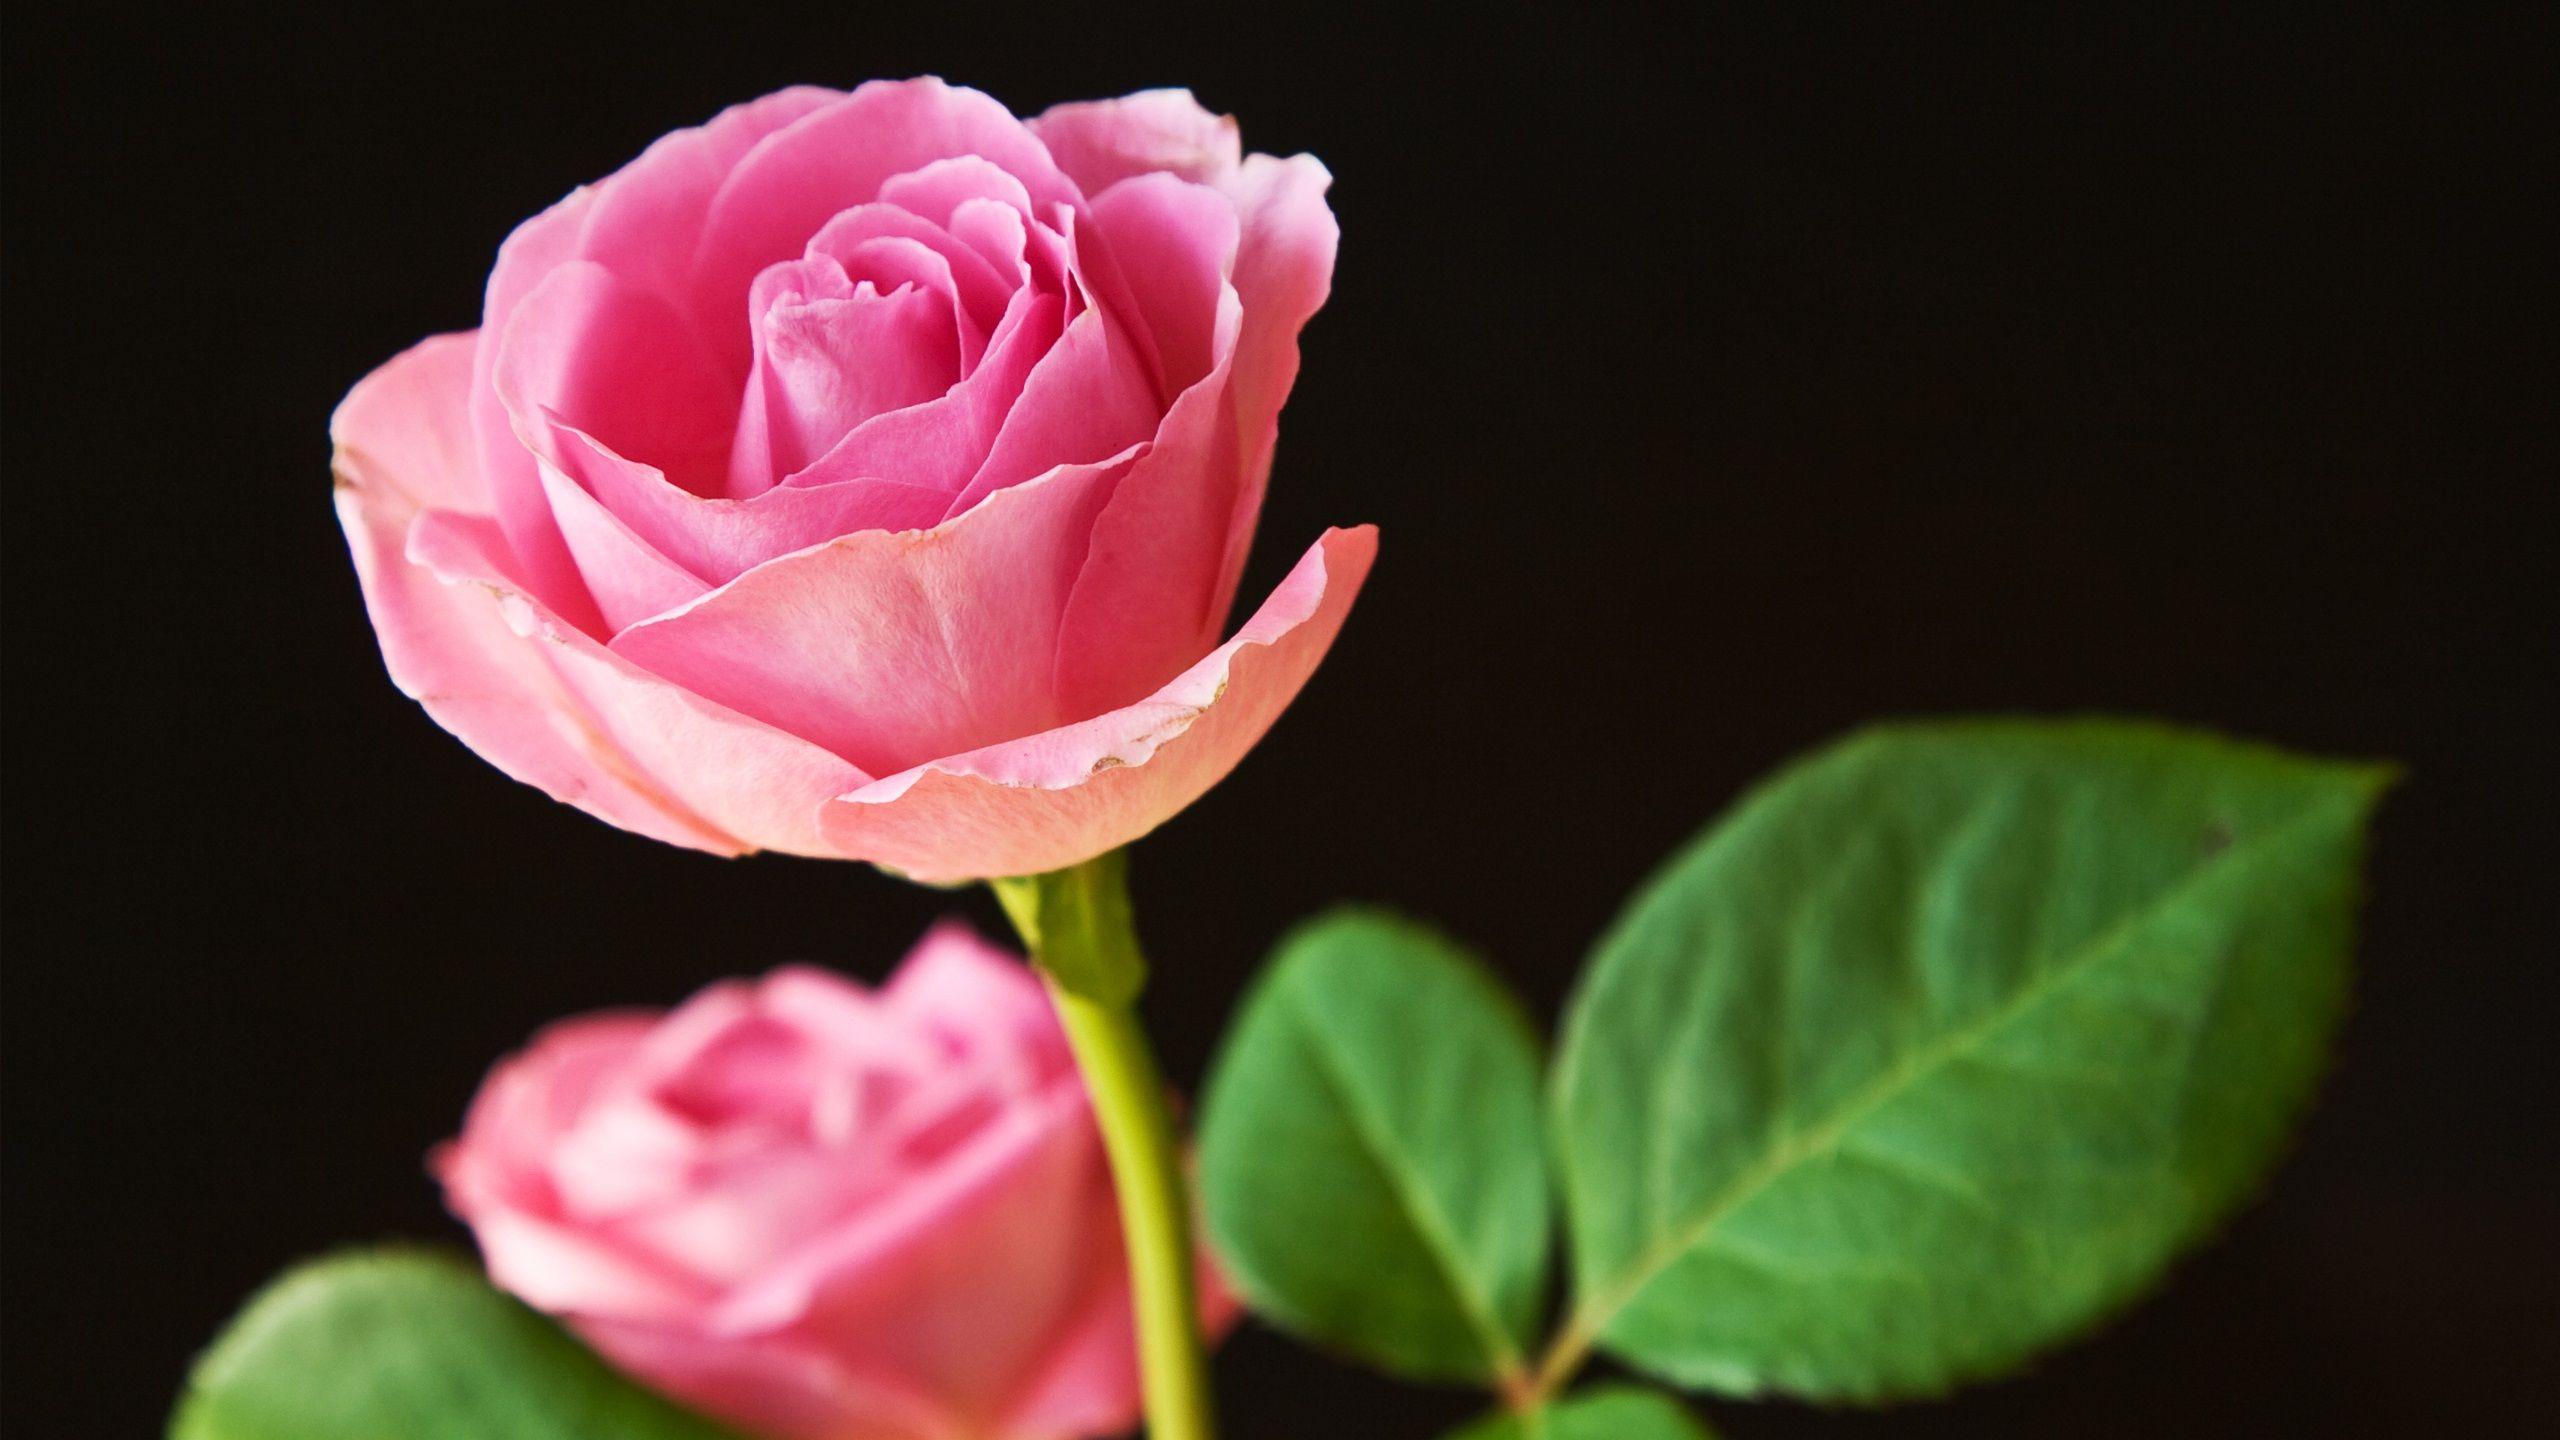 Pink roses wallpaper 2560x1440 flowers pinterest rose pink roses wallpaper 2560x1440 izmirmasajfo